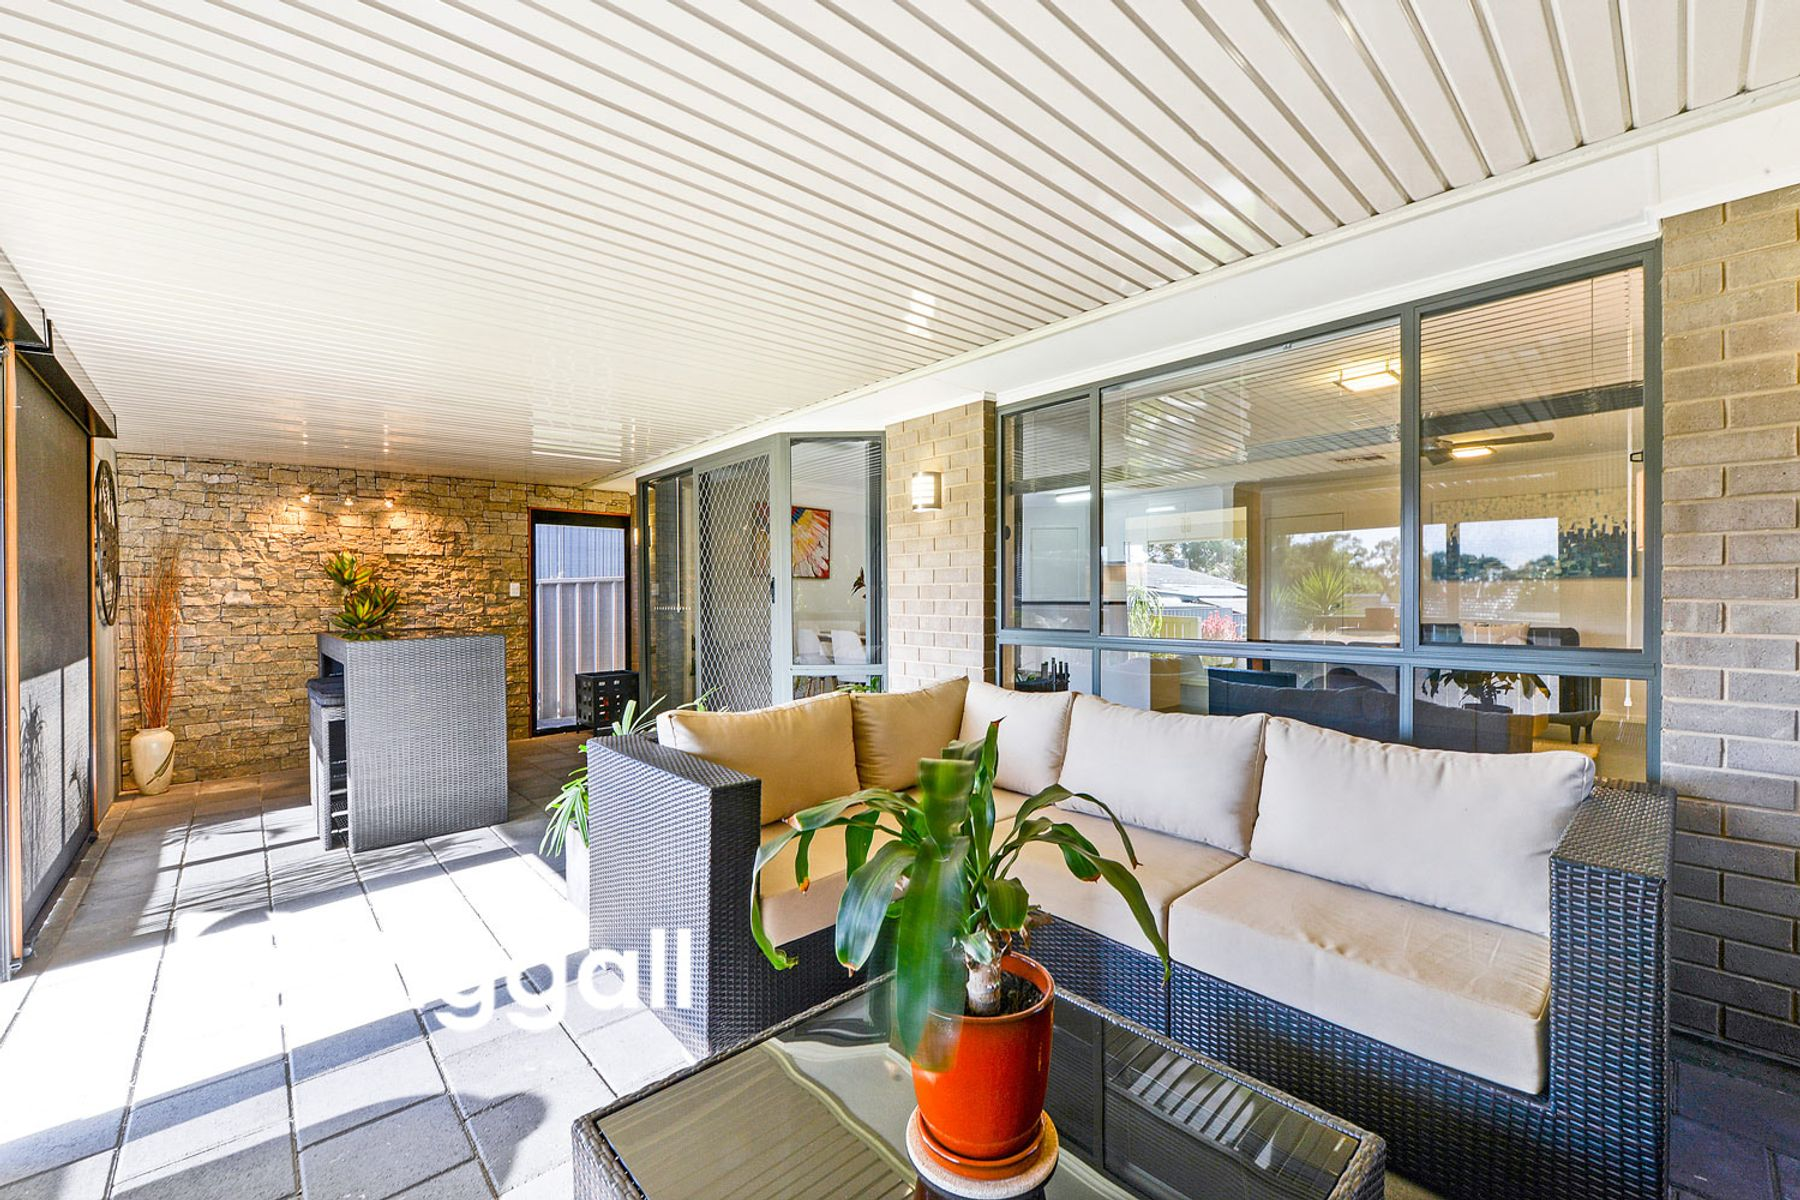 10a Condada Drive, Banksia Park, SA 5091